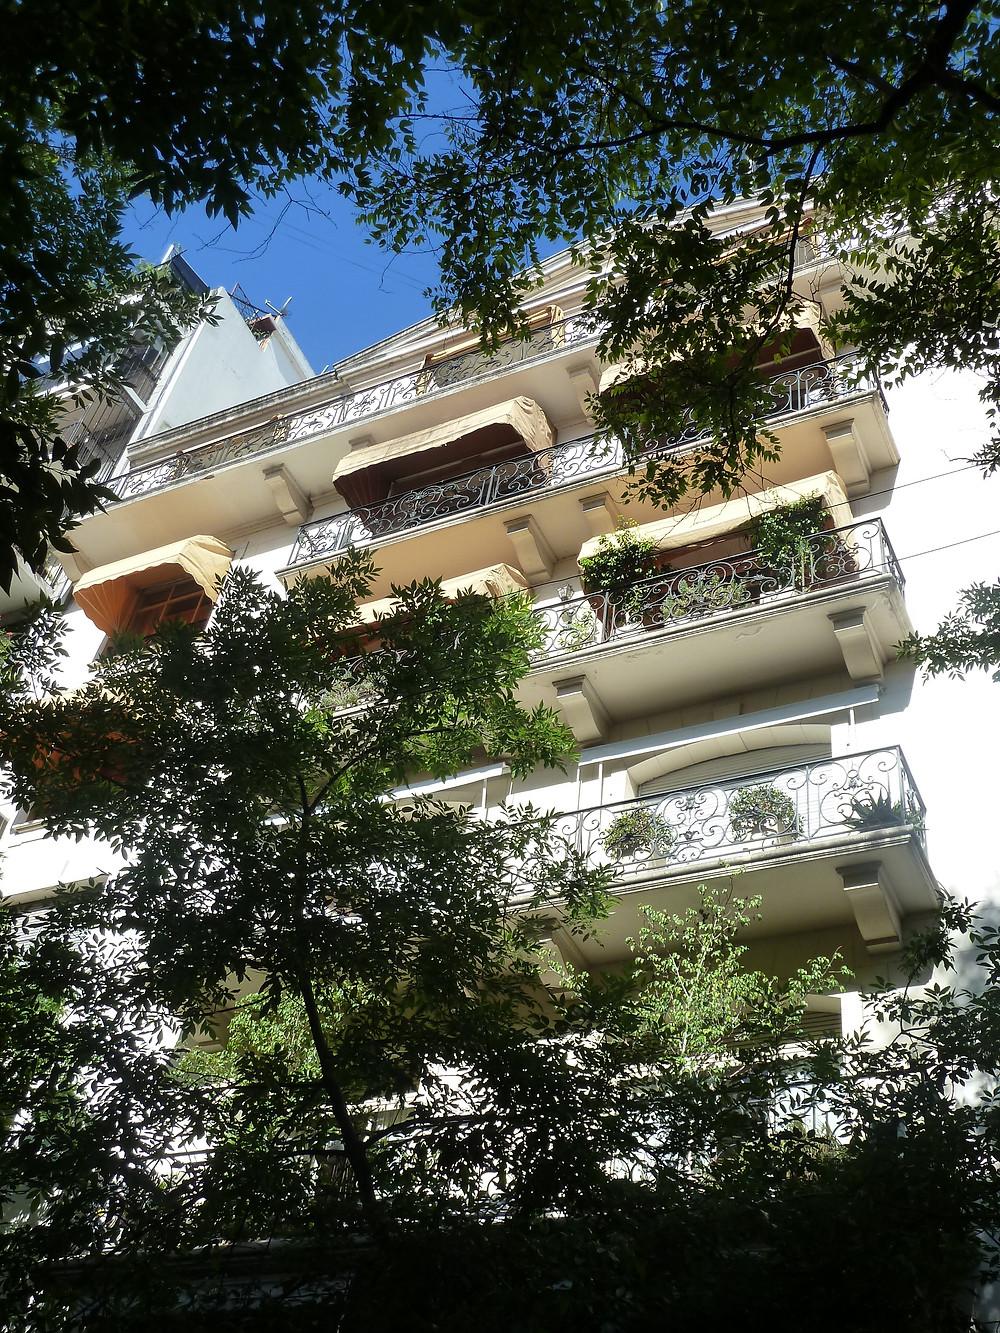 Parisian Building in Buenos Aires